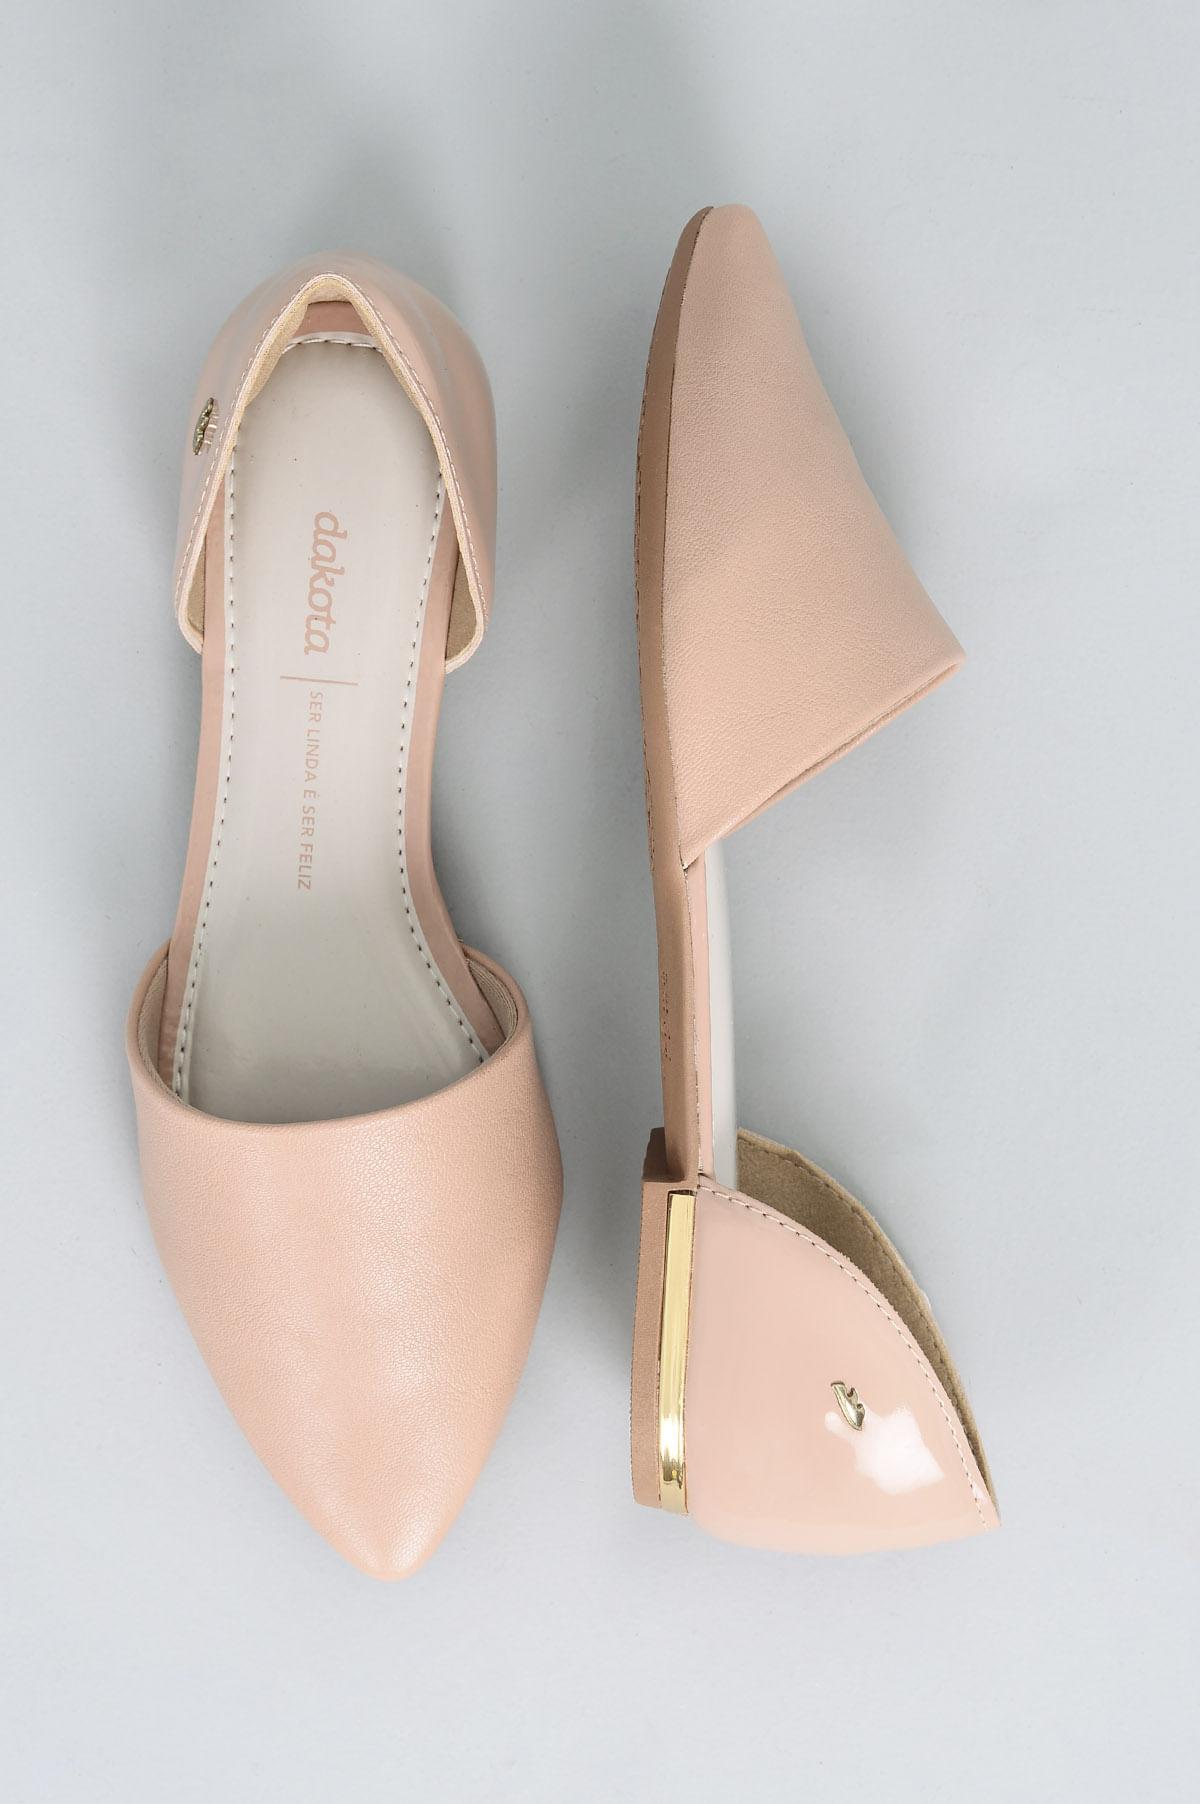 97c272ee07 Sapatilha Feminina Mathilda Dakota SINT - NUDE - Mundial Calçados